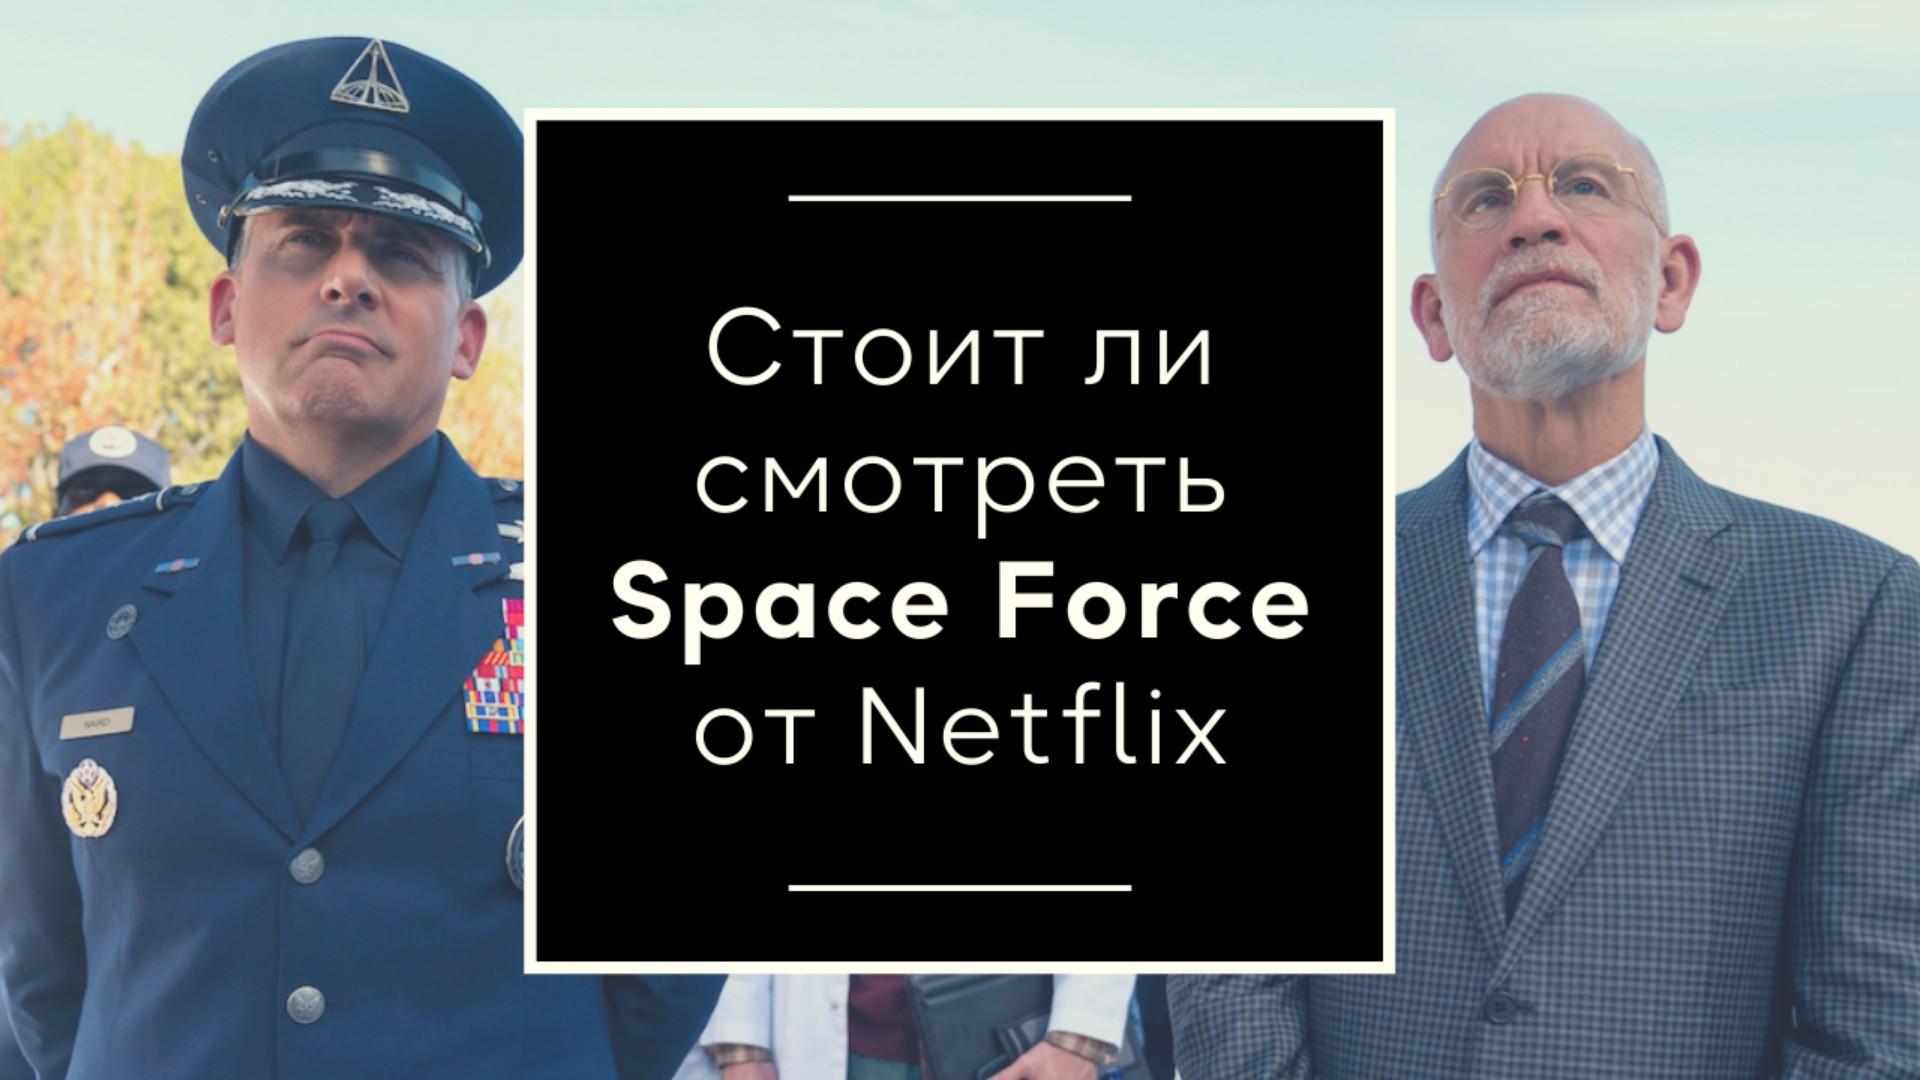 Стоит ли смотреть сериал Space Force от Netflix